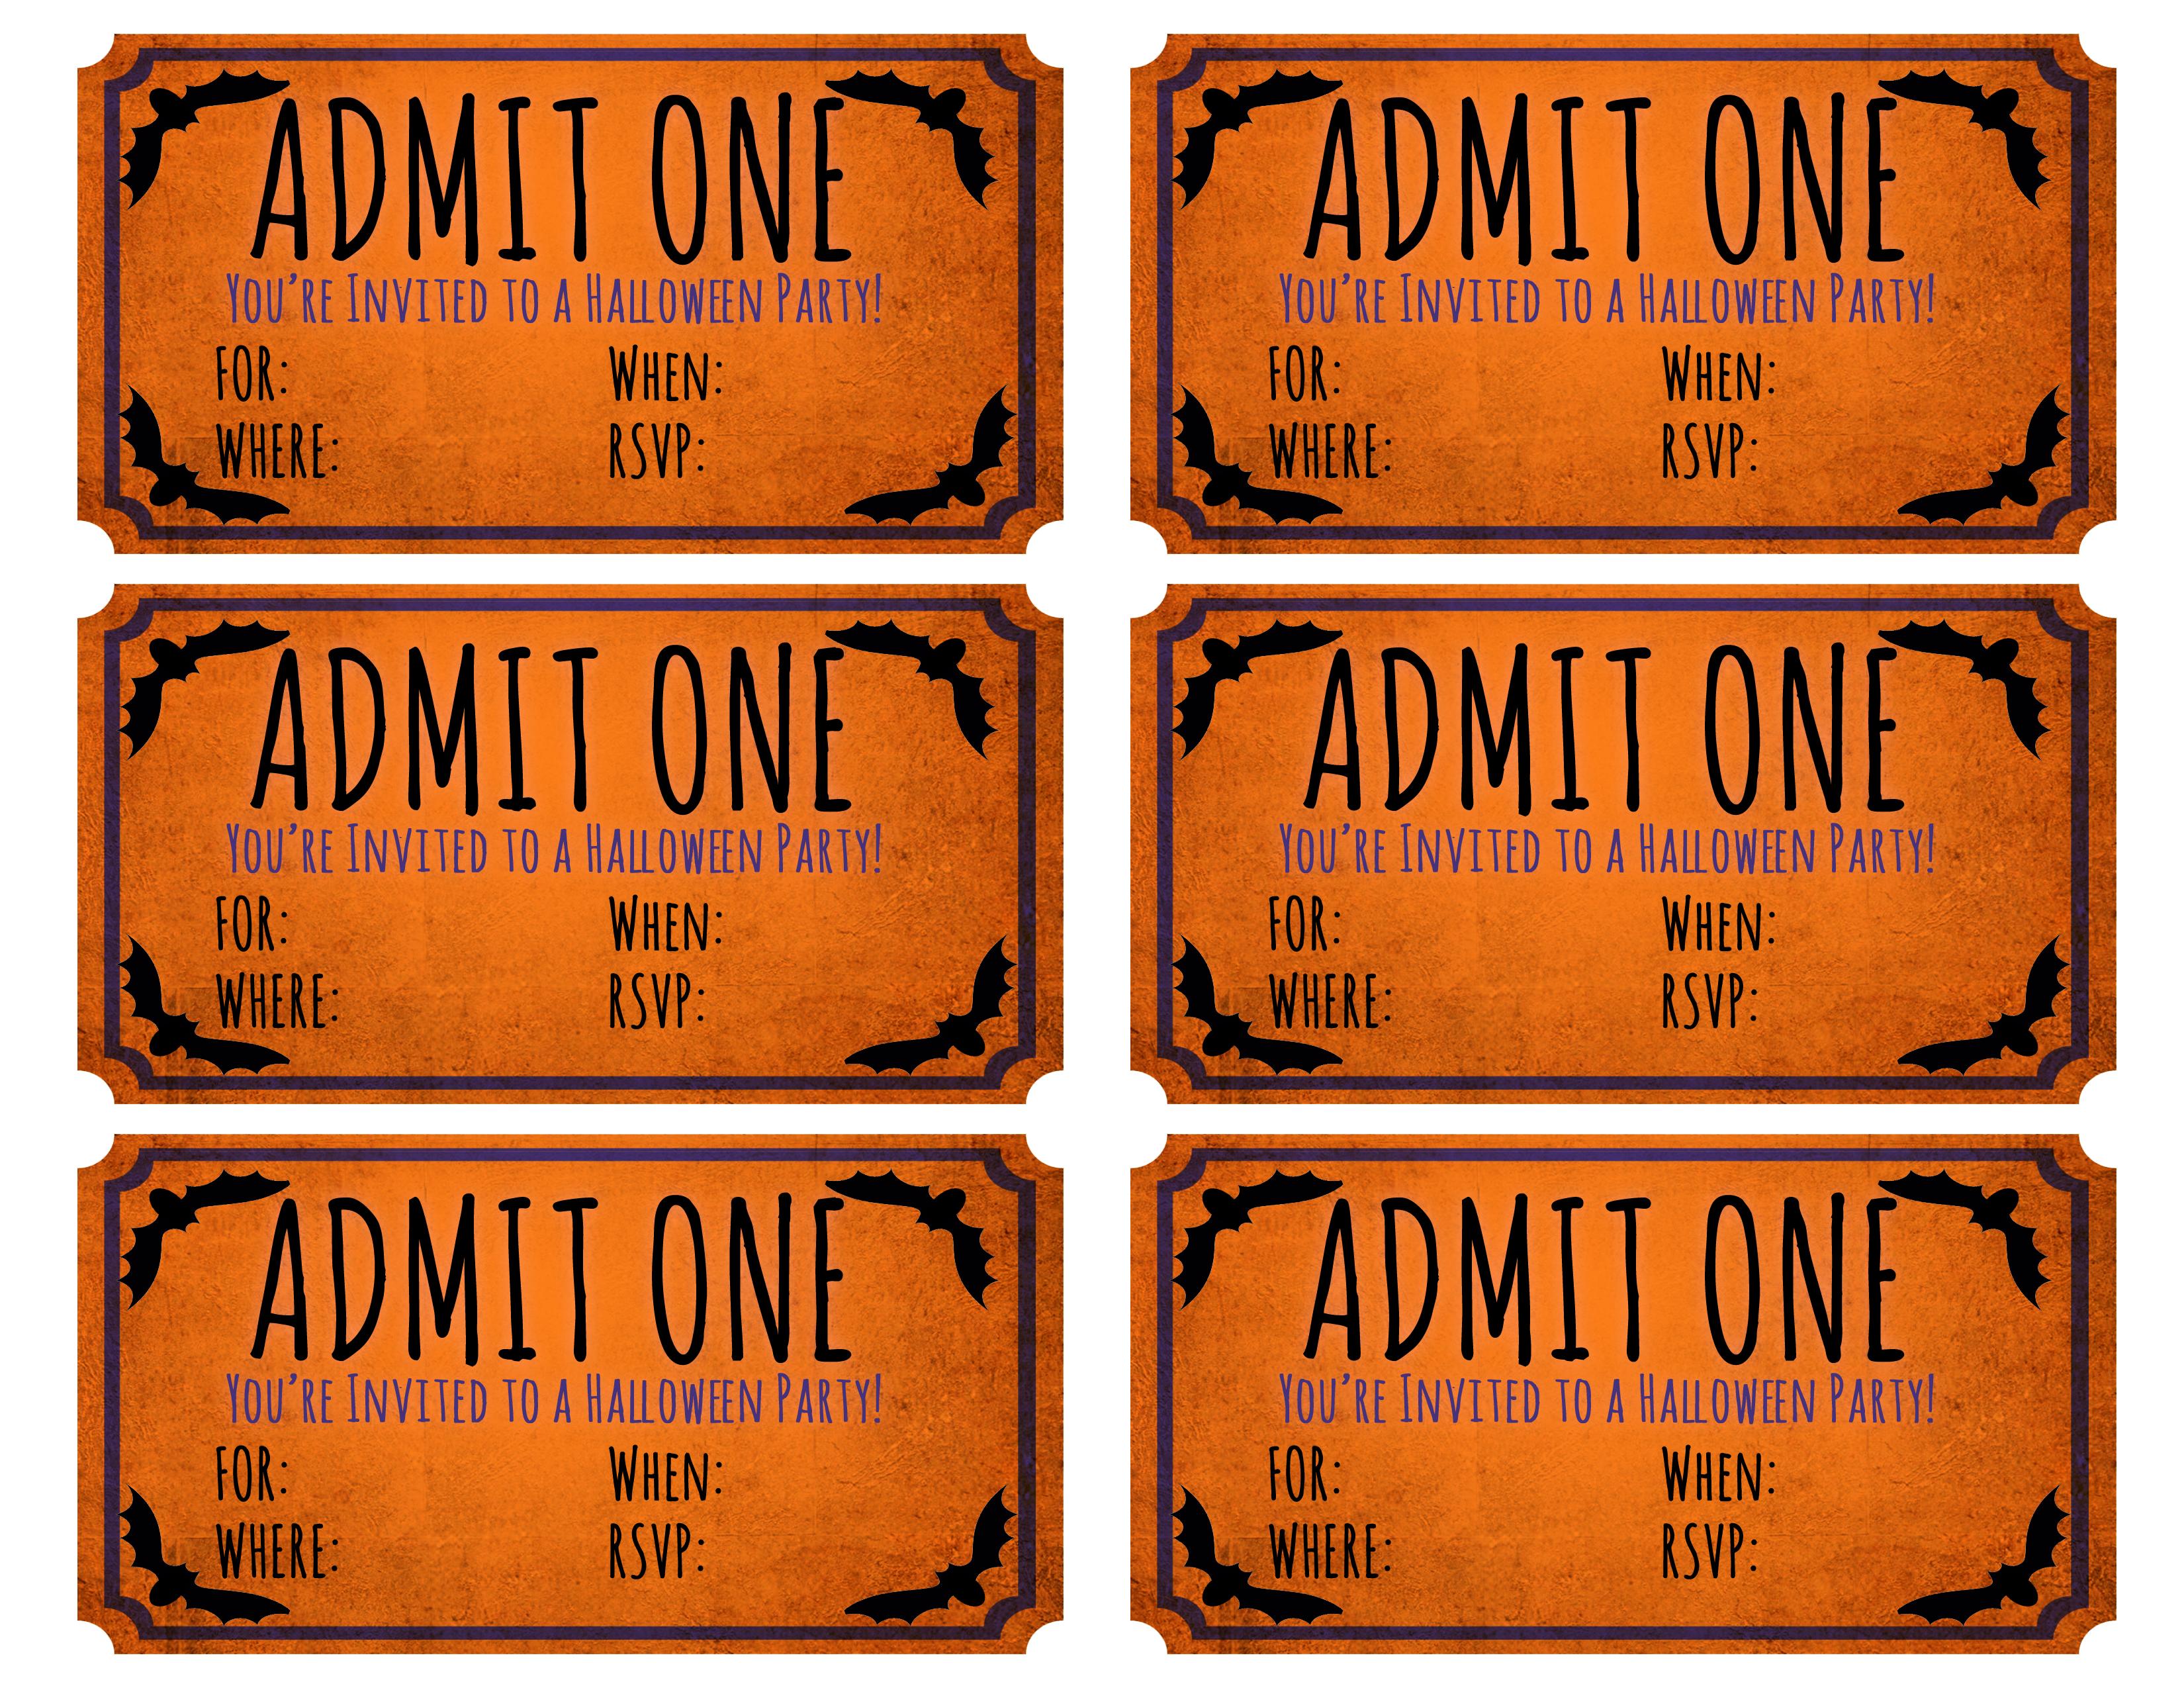 Blank cinema ticket clipart clipart royalty free stock HD Blank Movie Ticket Clip Art Vector Design » Free Vector Art ... clipart royalty free stock